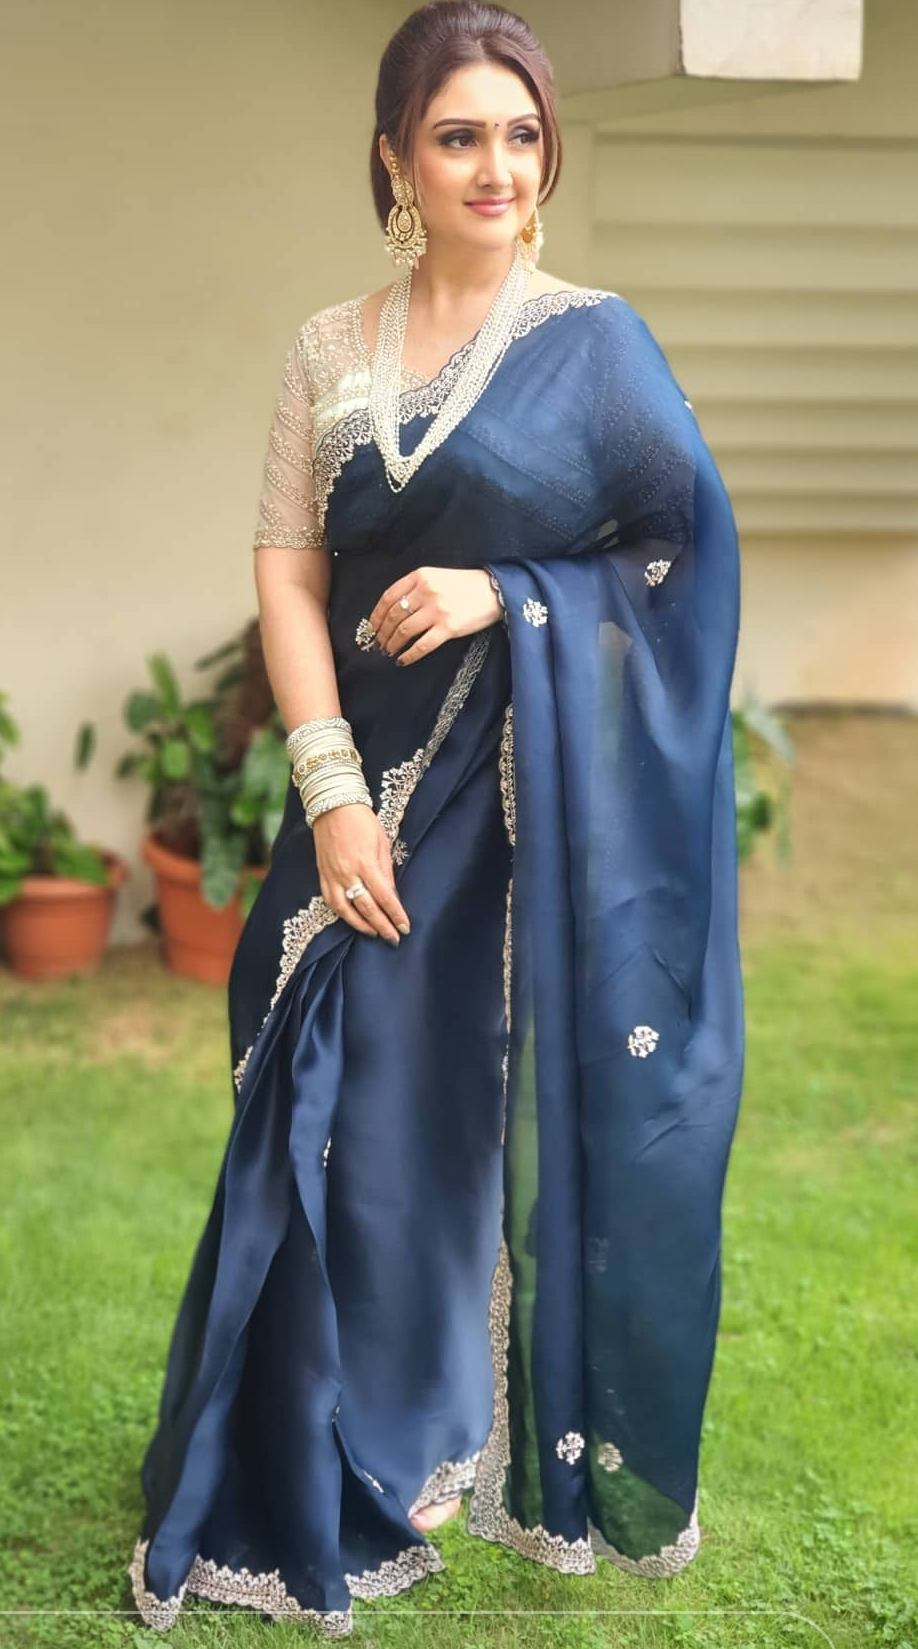 sridevi vijaykumar in a navy blue saree by Preesha for comedy stars-4